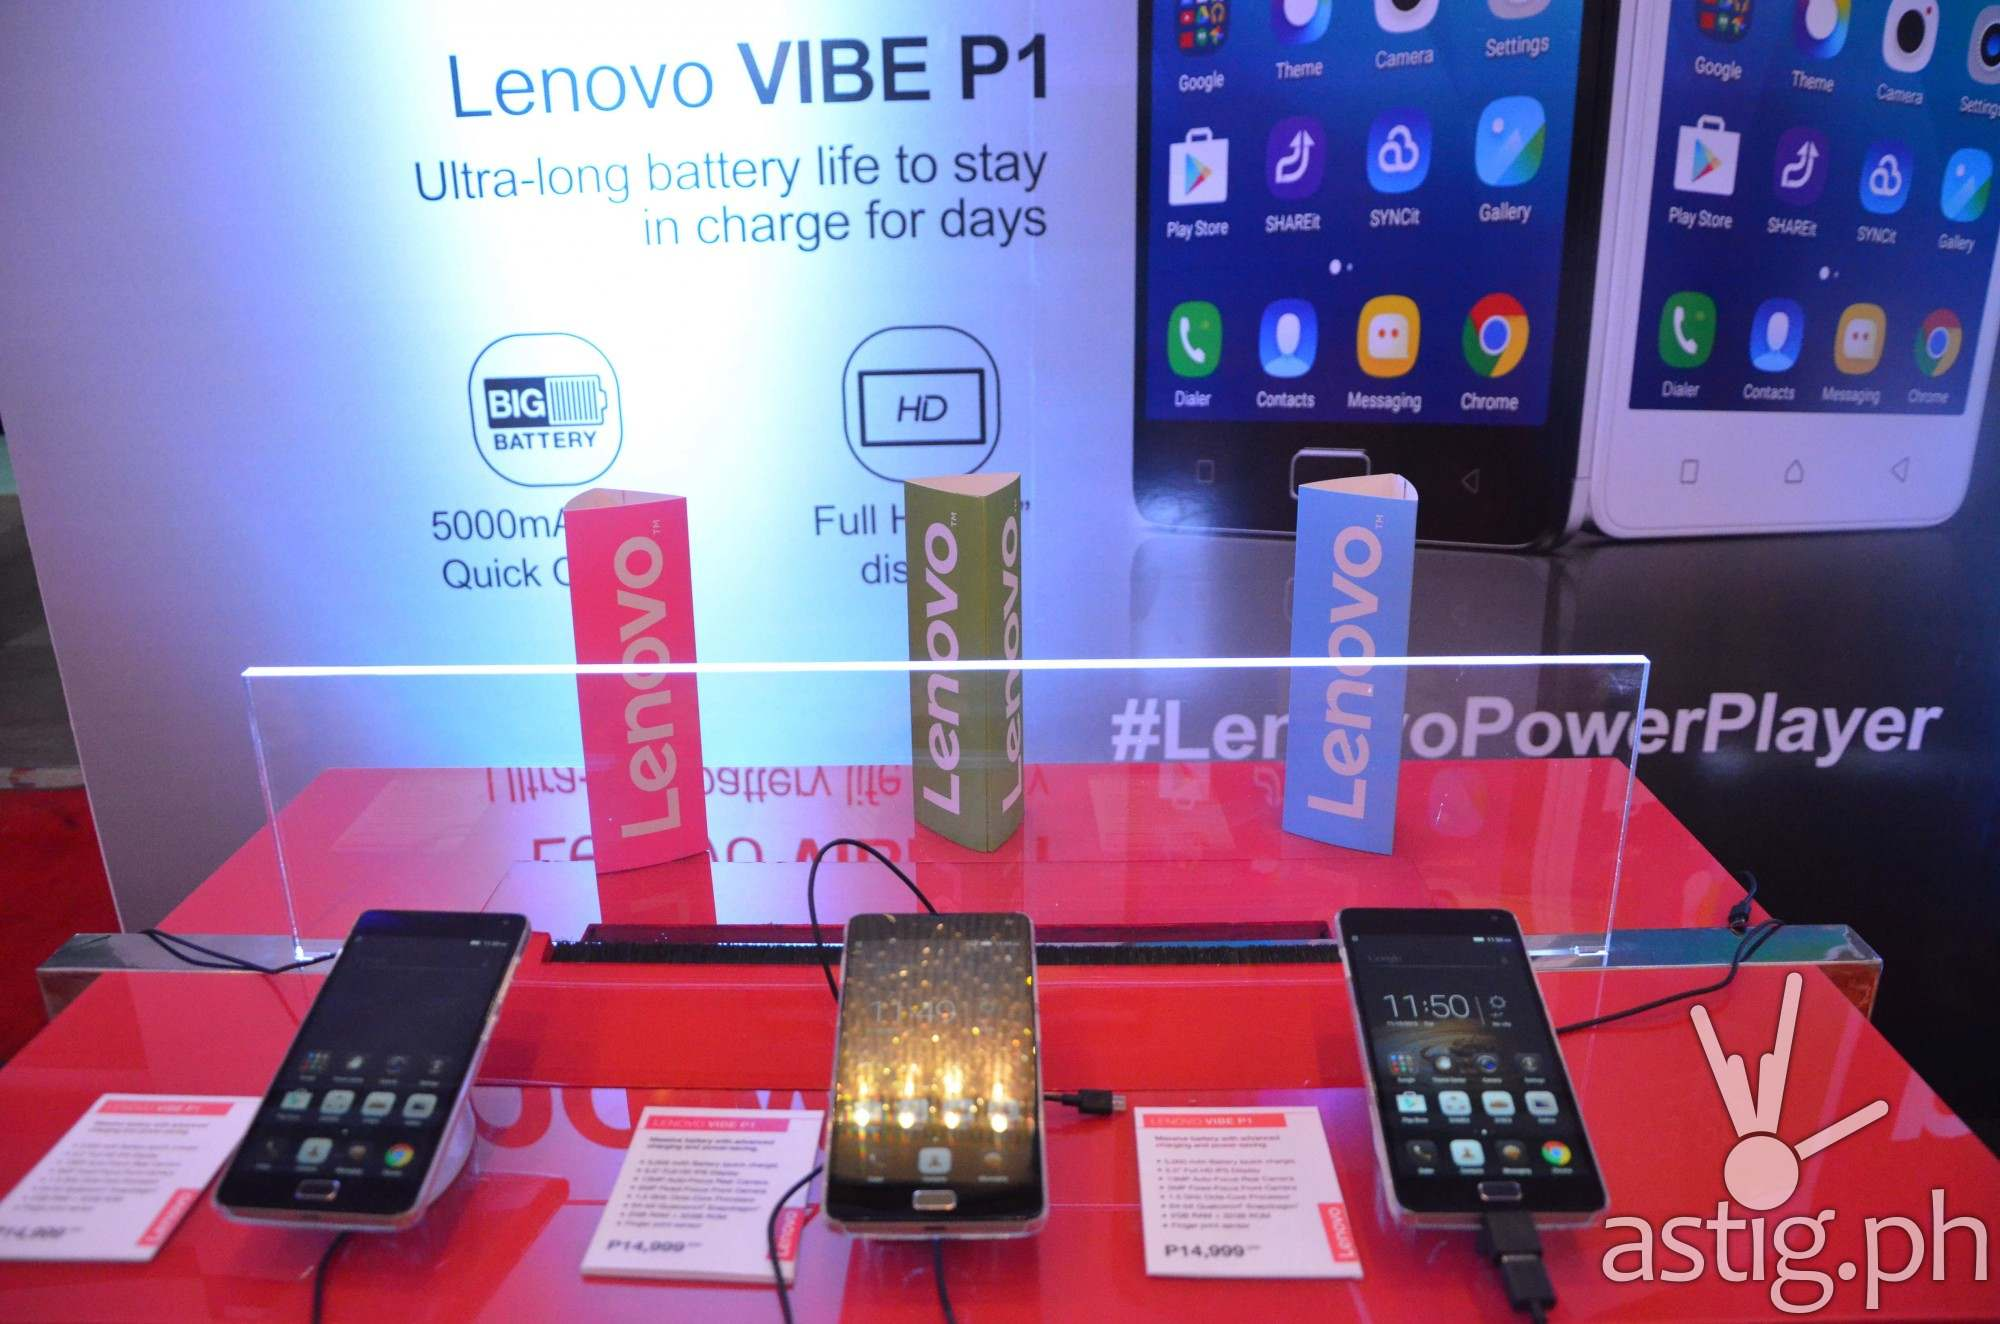 Lenovo VIBE smartphones